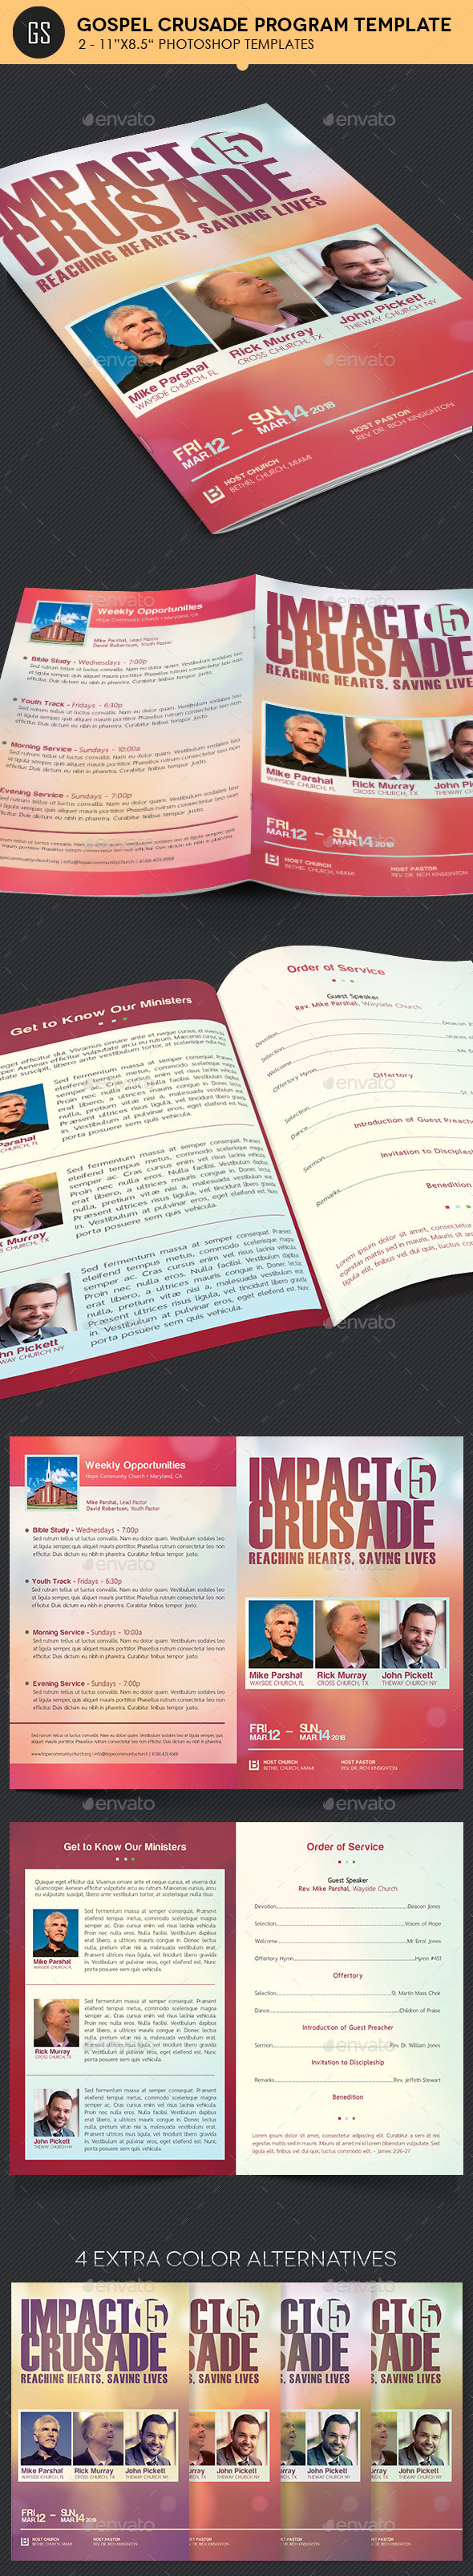 Gospel Crusade Program Template - Informational Brochures